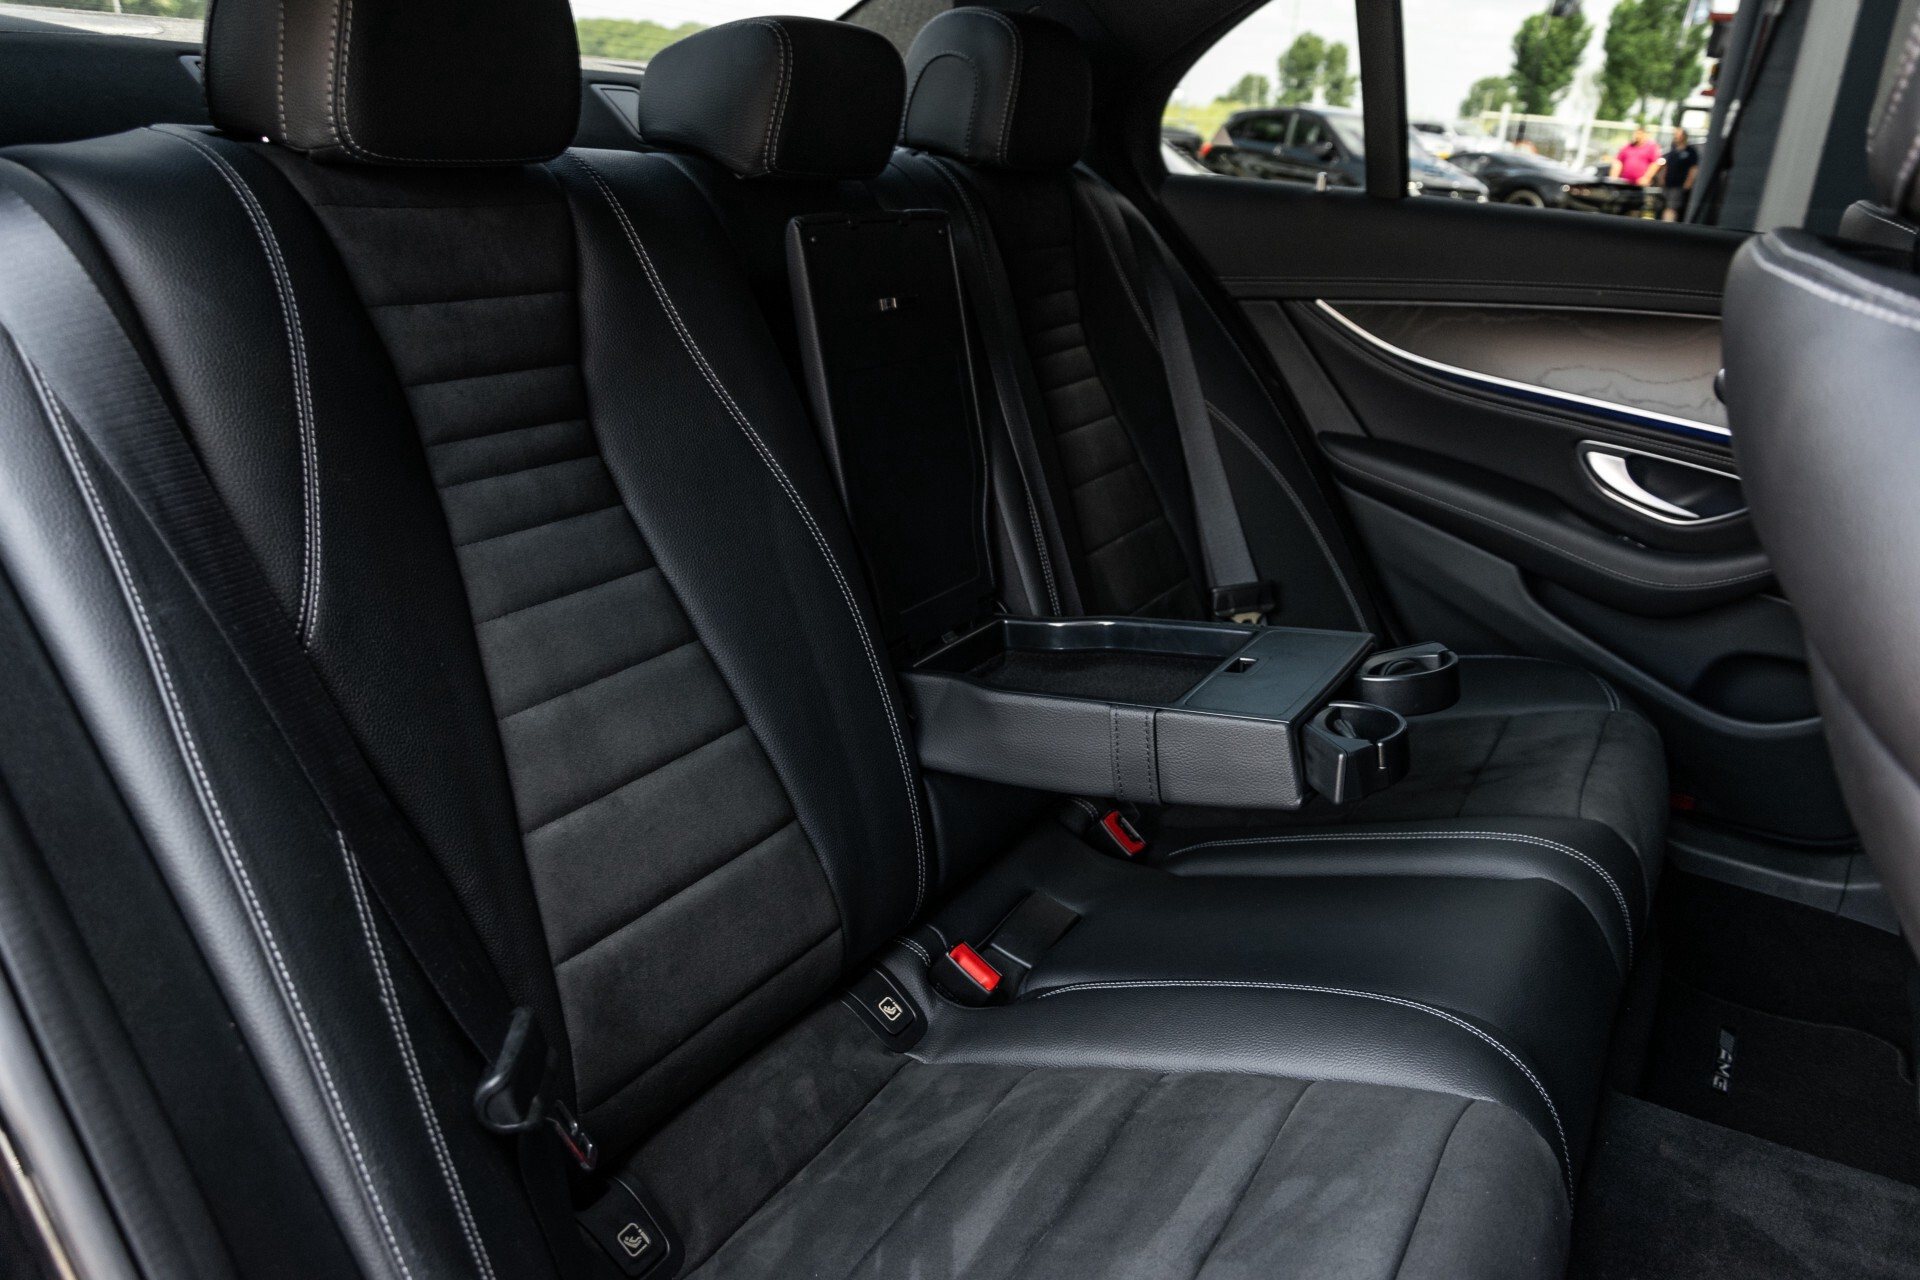 "Mercedes-Benz E-Klasse 220 d AMG Night Panorama/Widescreen/Burmester/20""/Wegklapbare trekhaak Aut9 Foto 4"